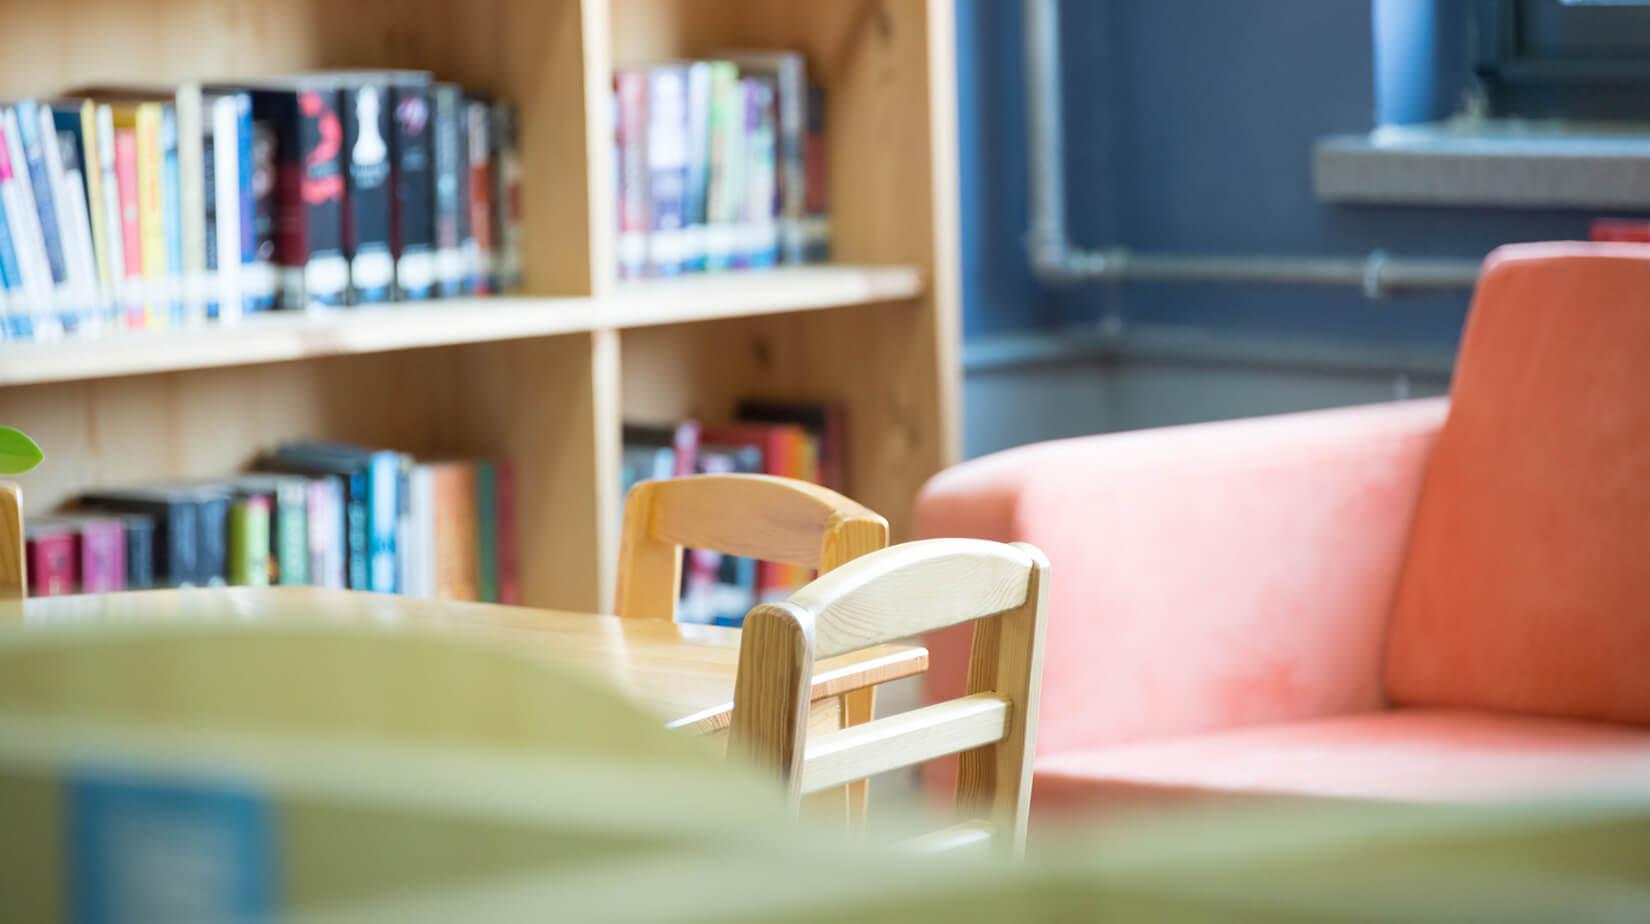 Nursery school with tables